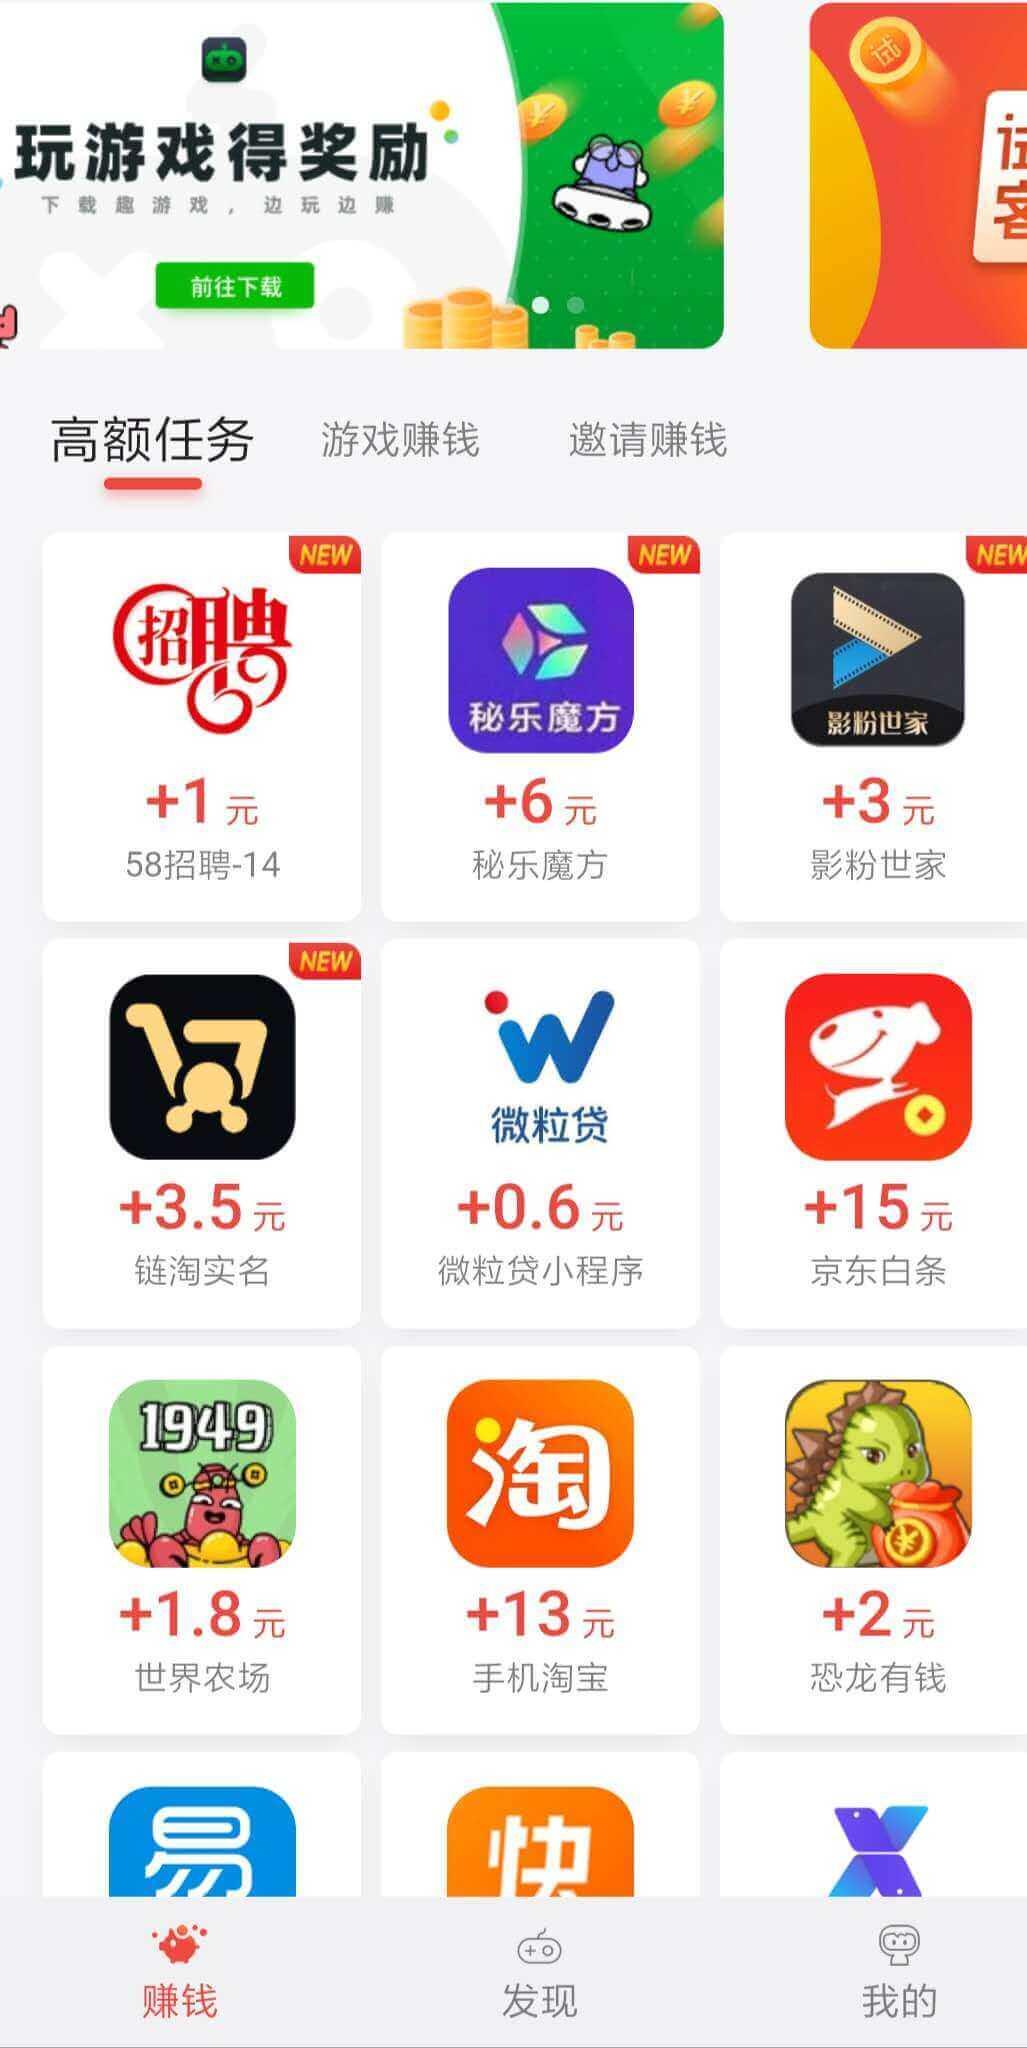 app试玩员是什么?APP试玩就能挣钱是不是骗局 手赚经验 第3张